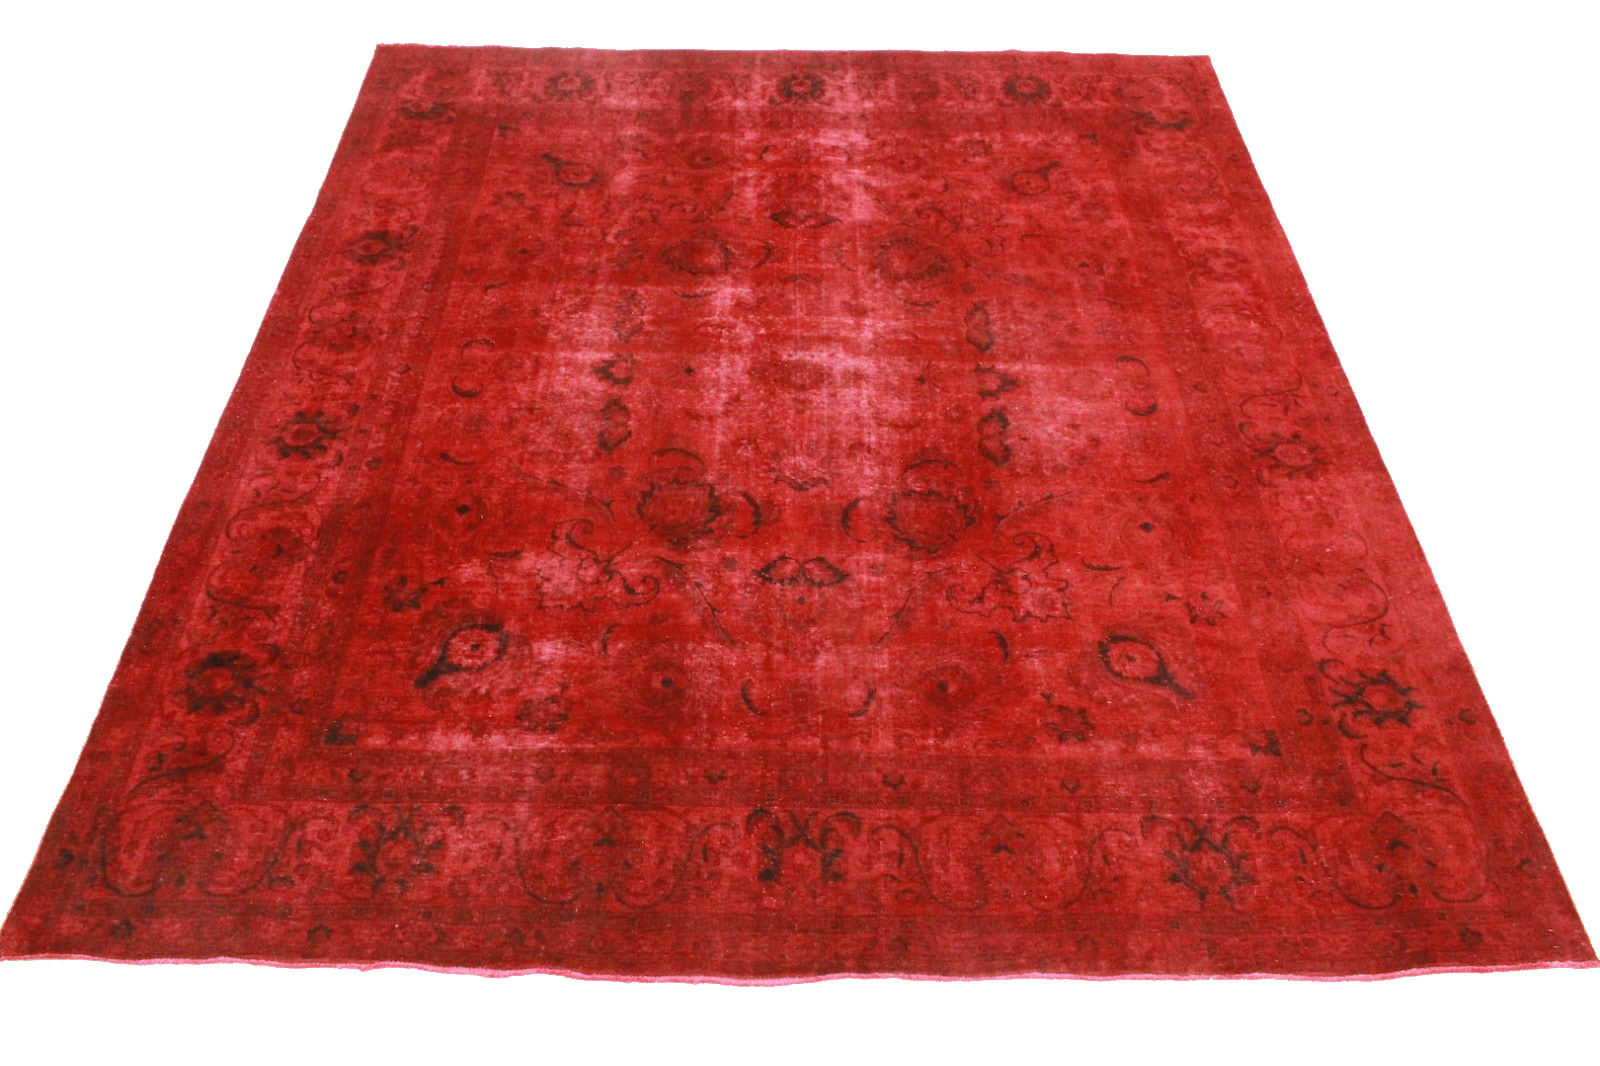 vintage teppich rot in 340x290cm 1001 3365 bei kaufen. Black Bedroom Furniture Sets. Home Design Ideas